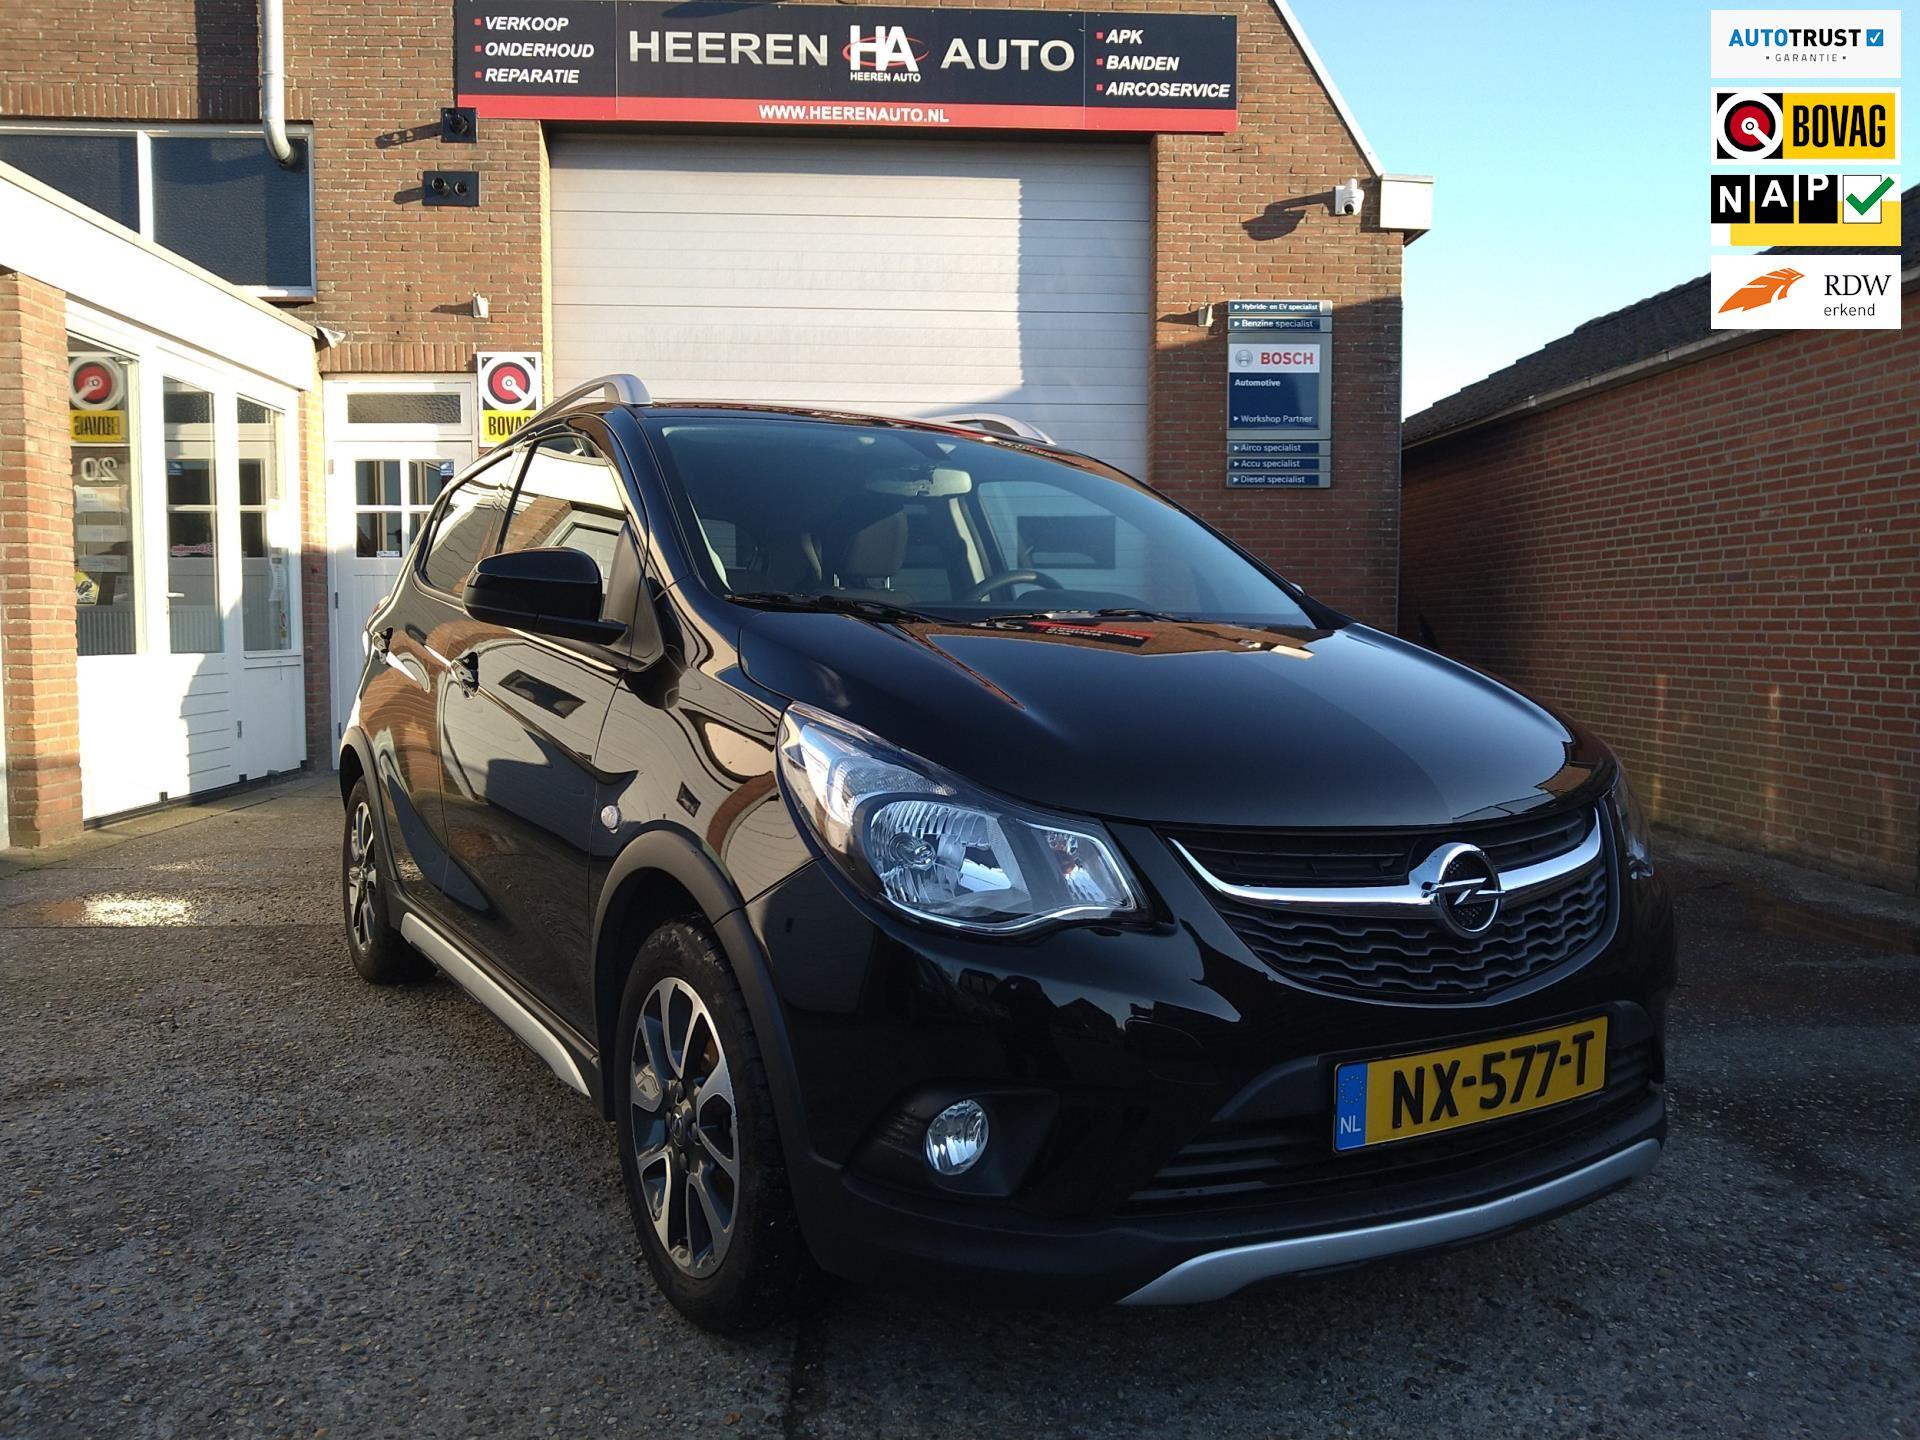 Opel KARL occasion - Heeren Auto v.o.f.